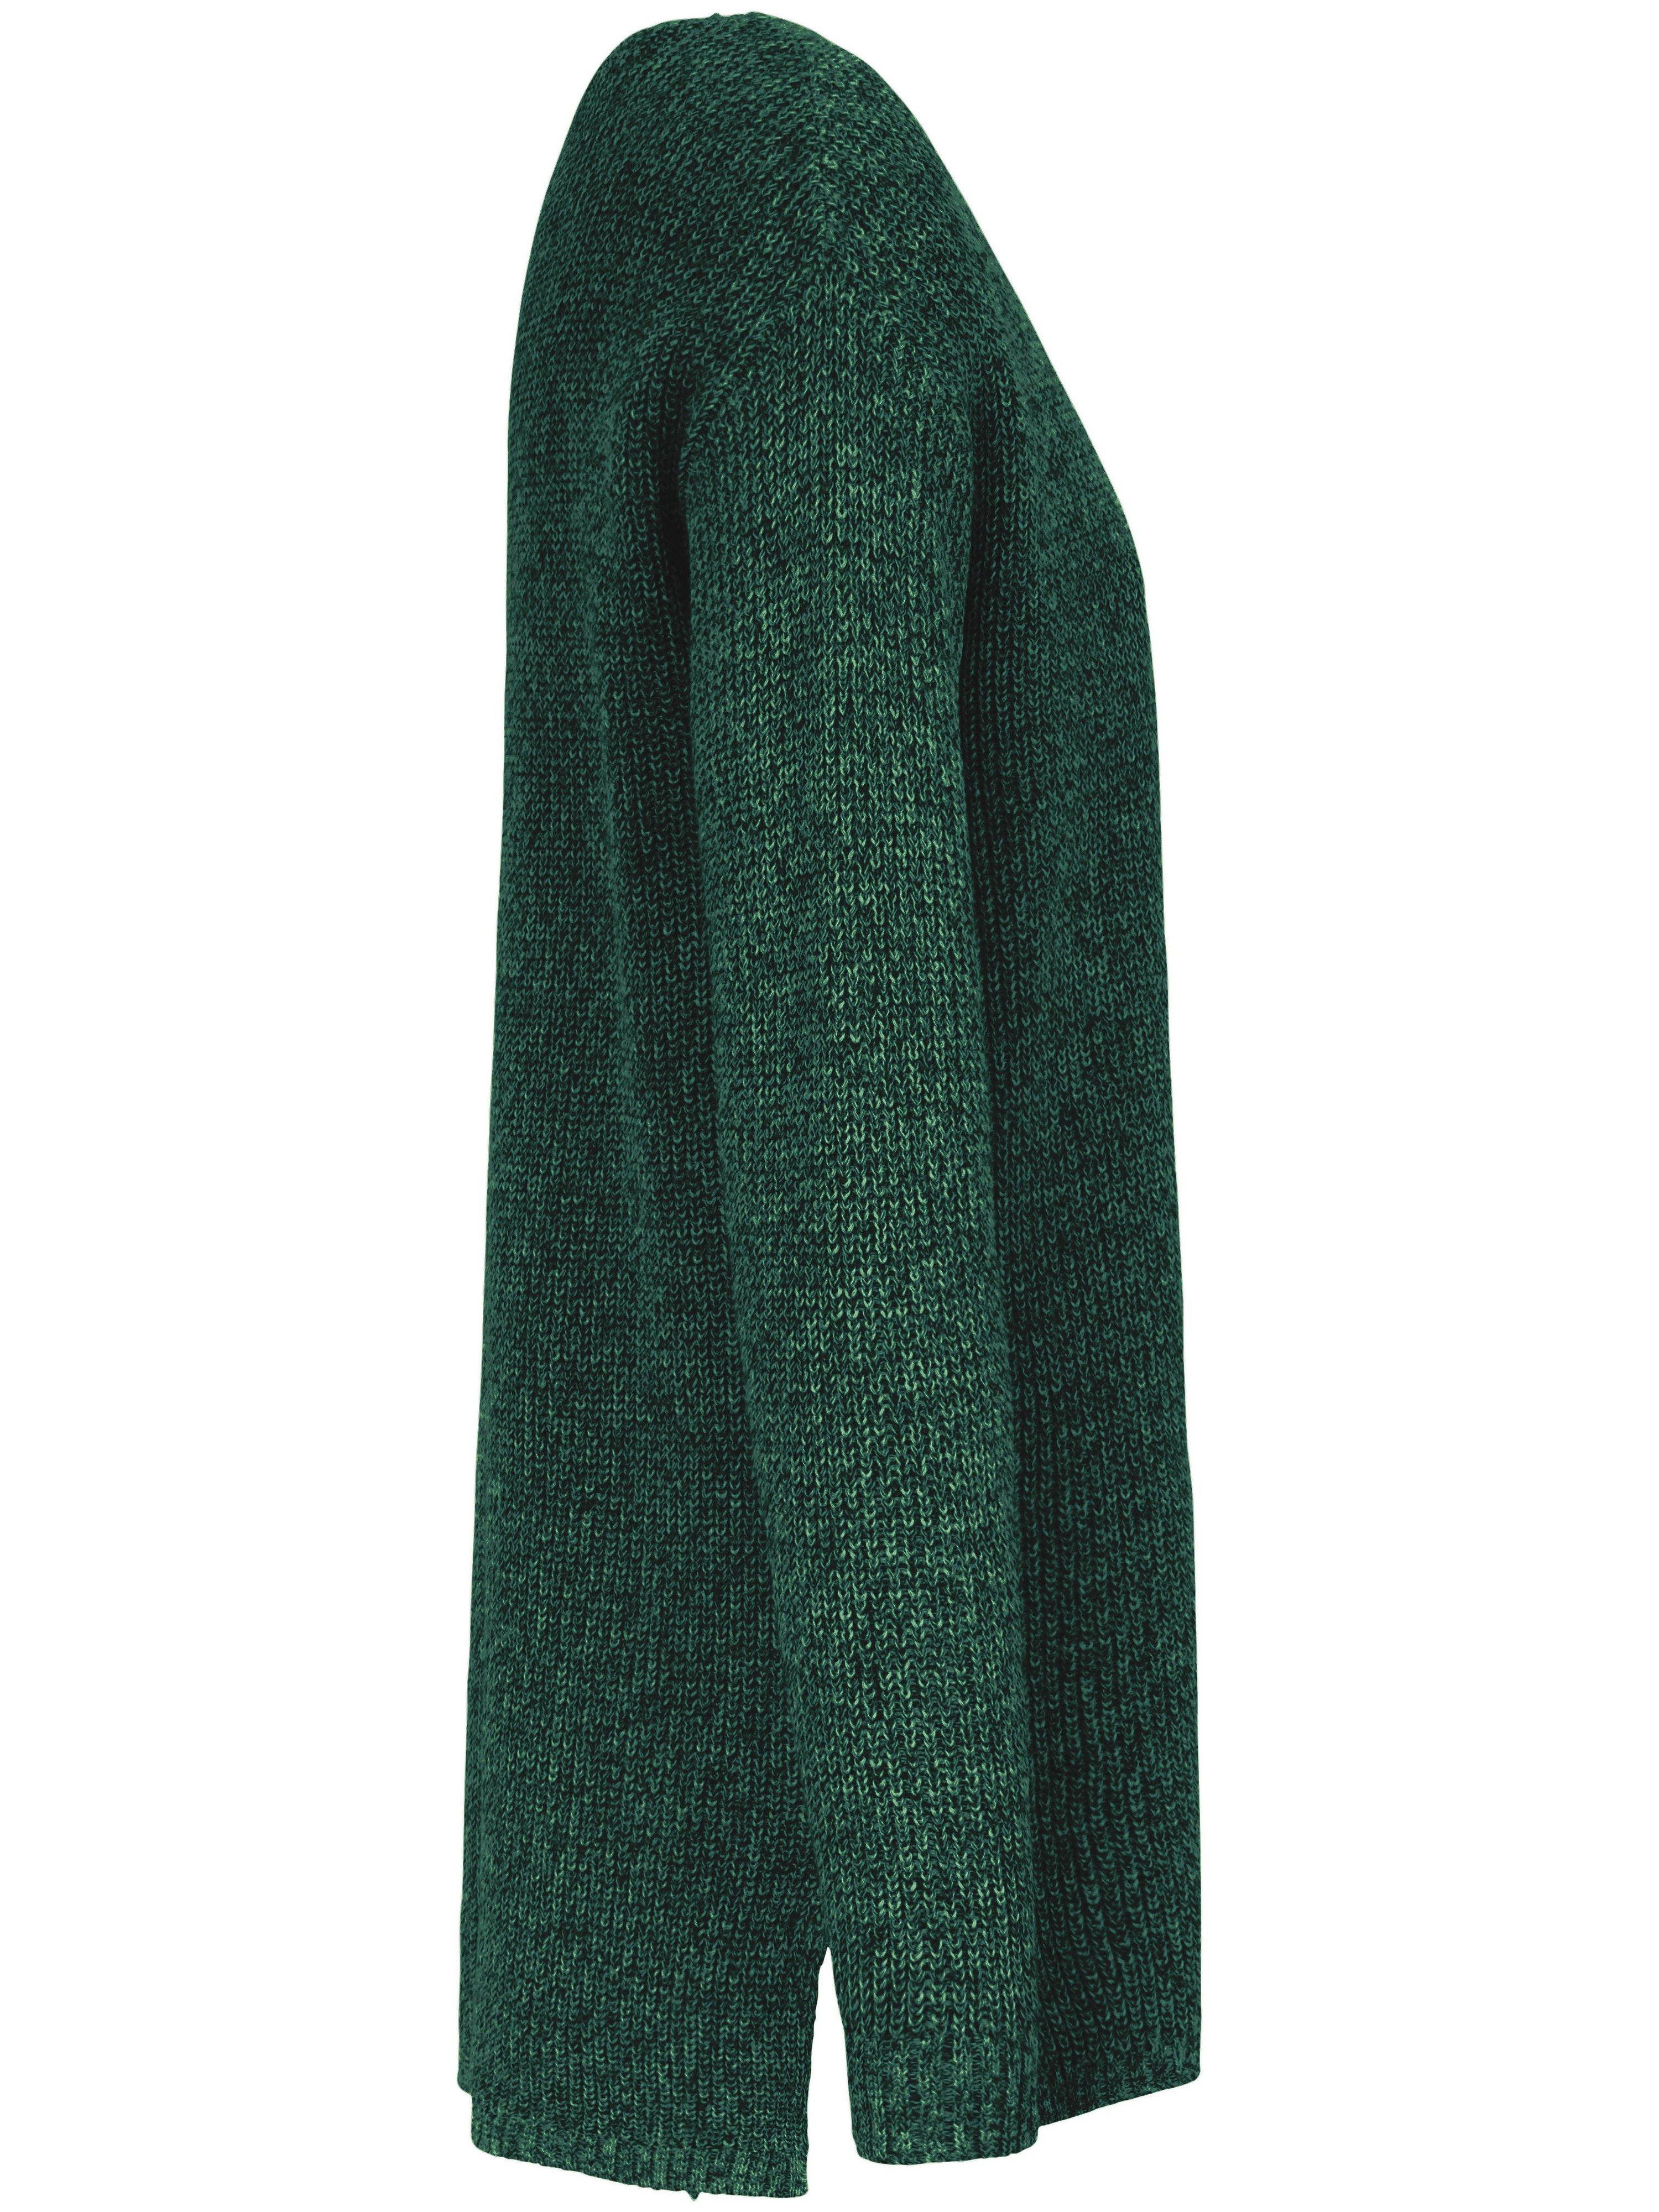 Strikbluse rund hals i 100% SUPIMA®-bomuld Fra Peter Hahn grøn